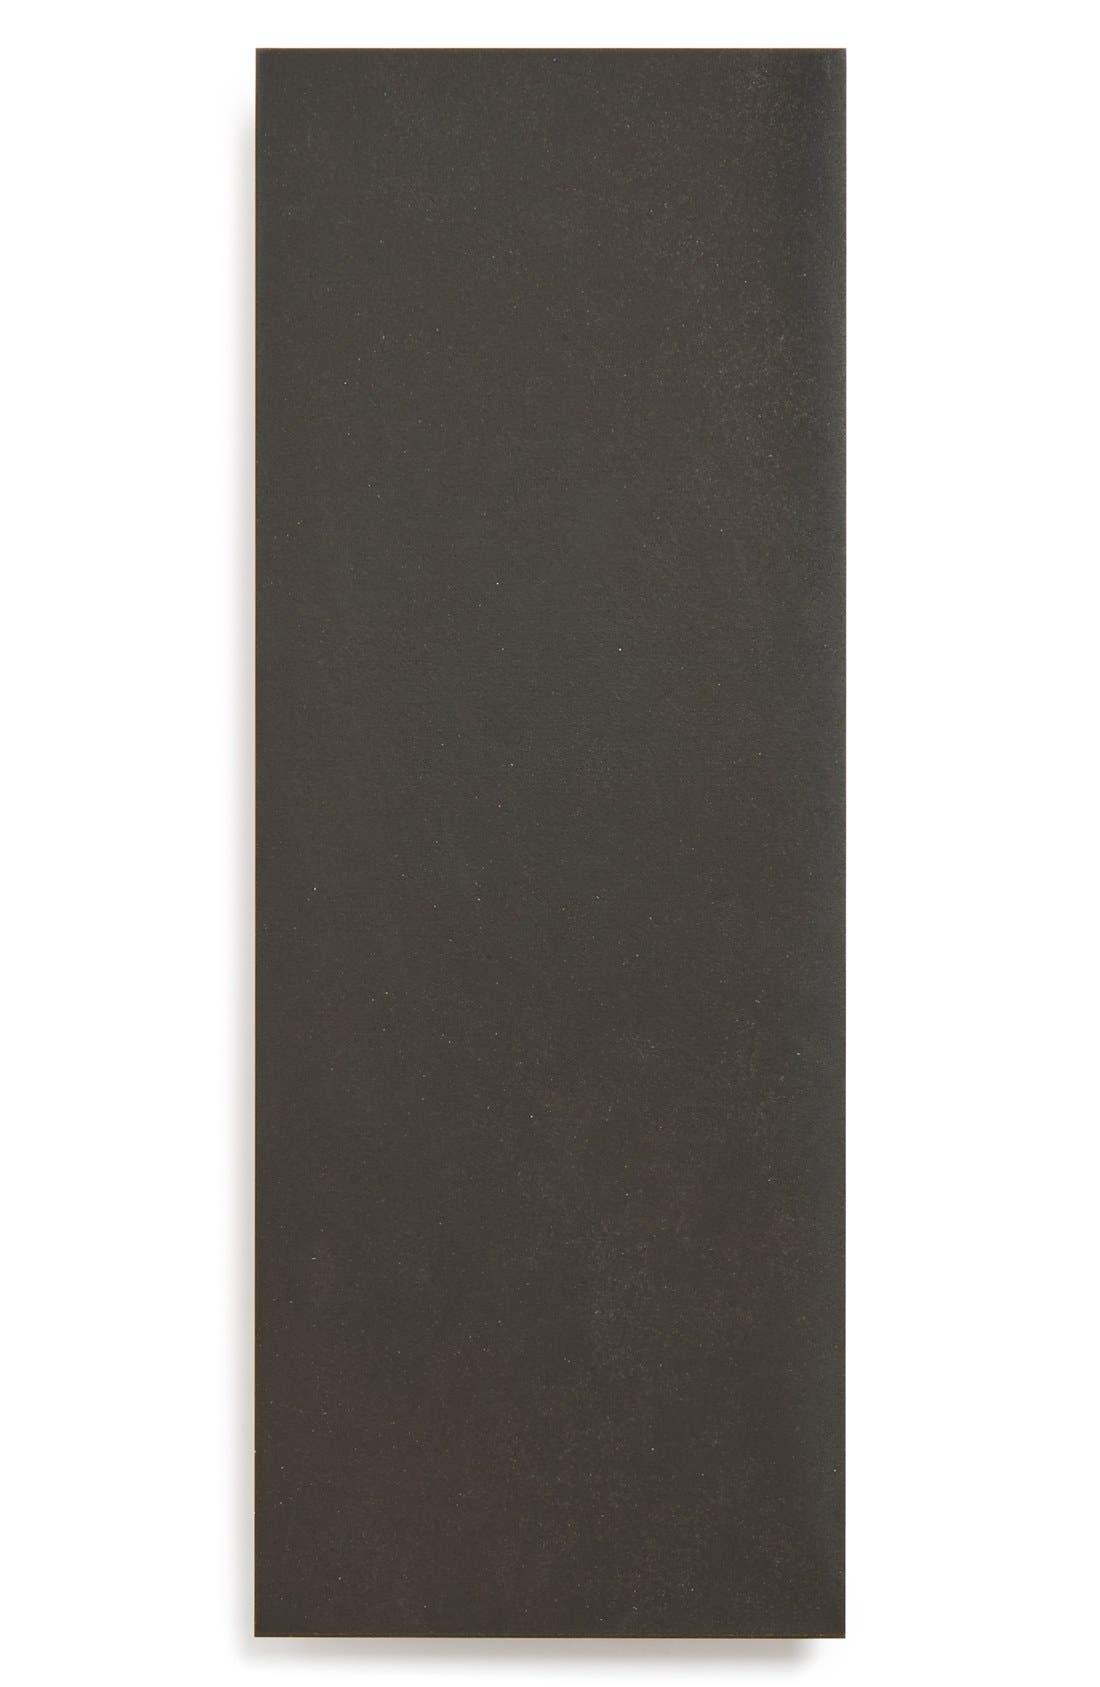 Alternate Image 1 Selected - Petal Lane 11 Inch Letter Magnetized Chalkboard